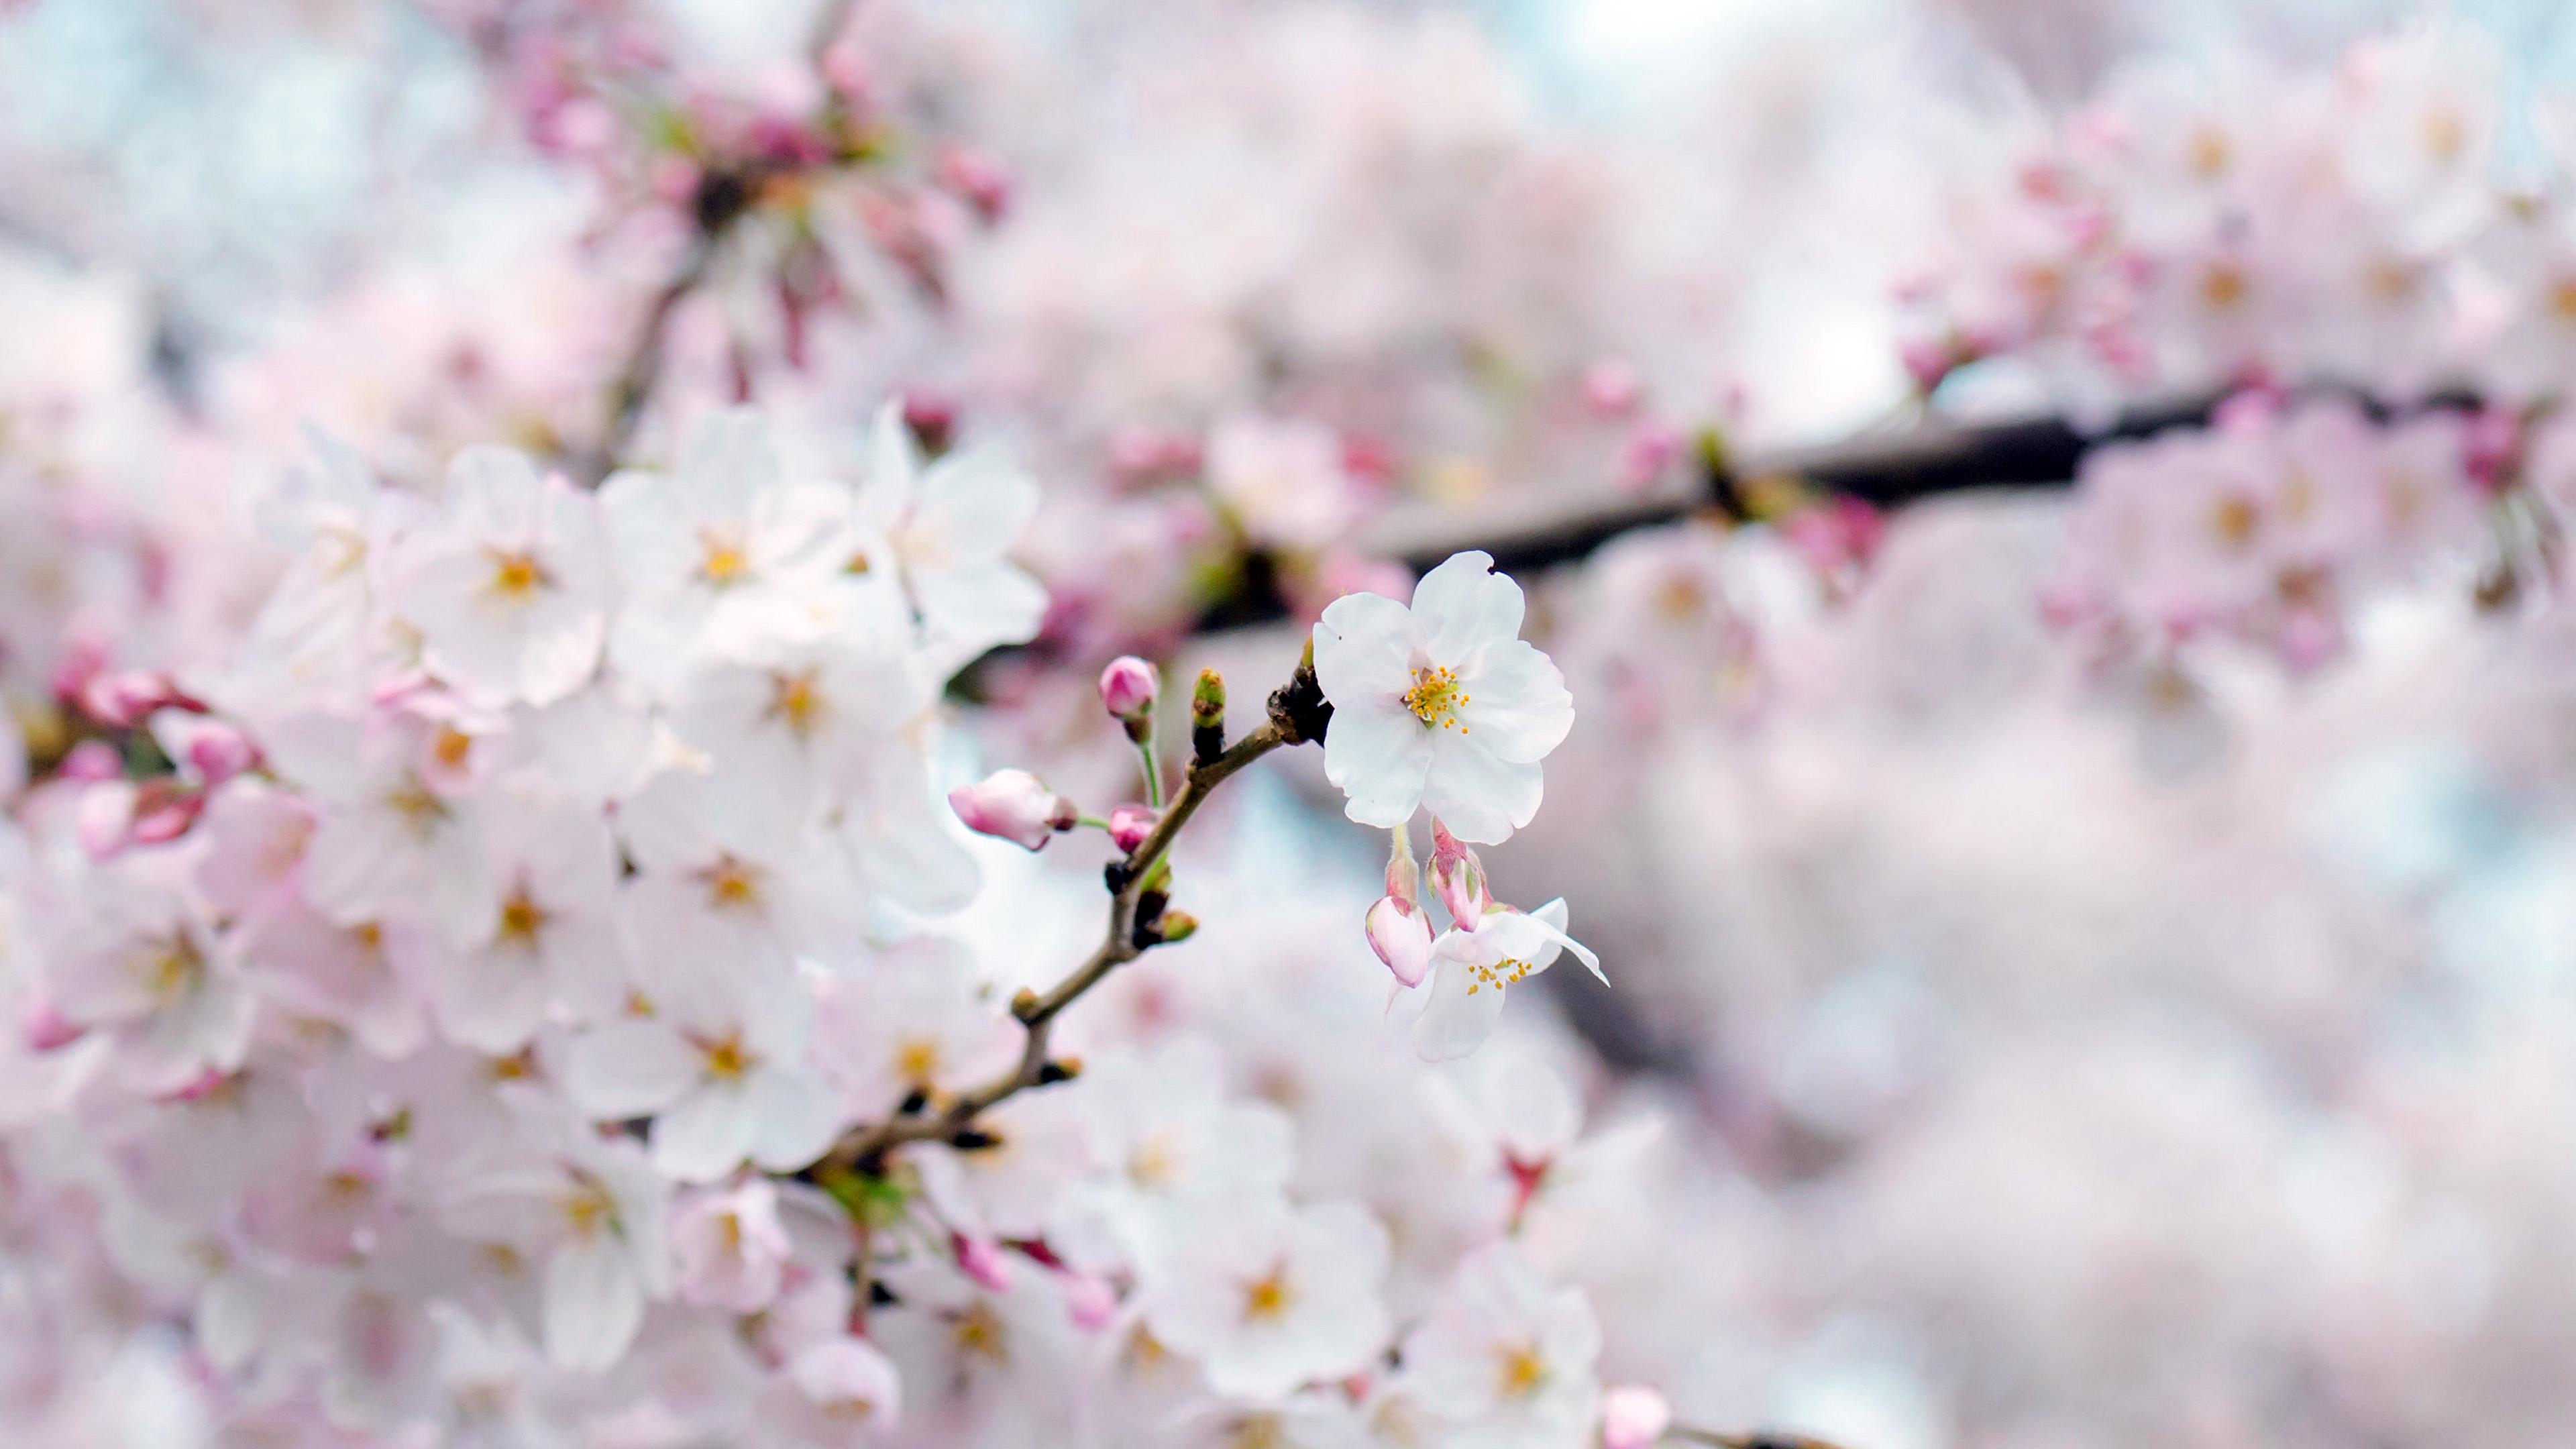 Google Images Fall Wallpaper Nx70 Cherry Blossom Flower Spring Tree Bokeh Nature Wallpaper